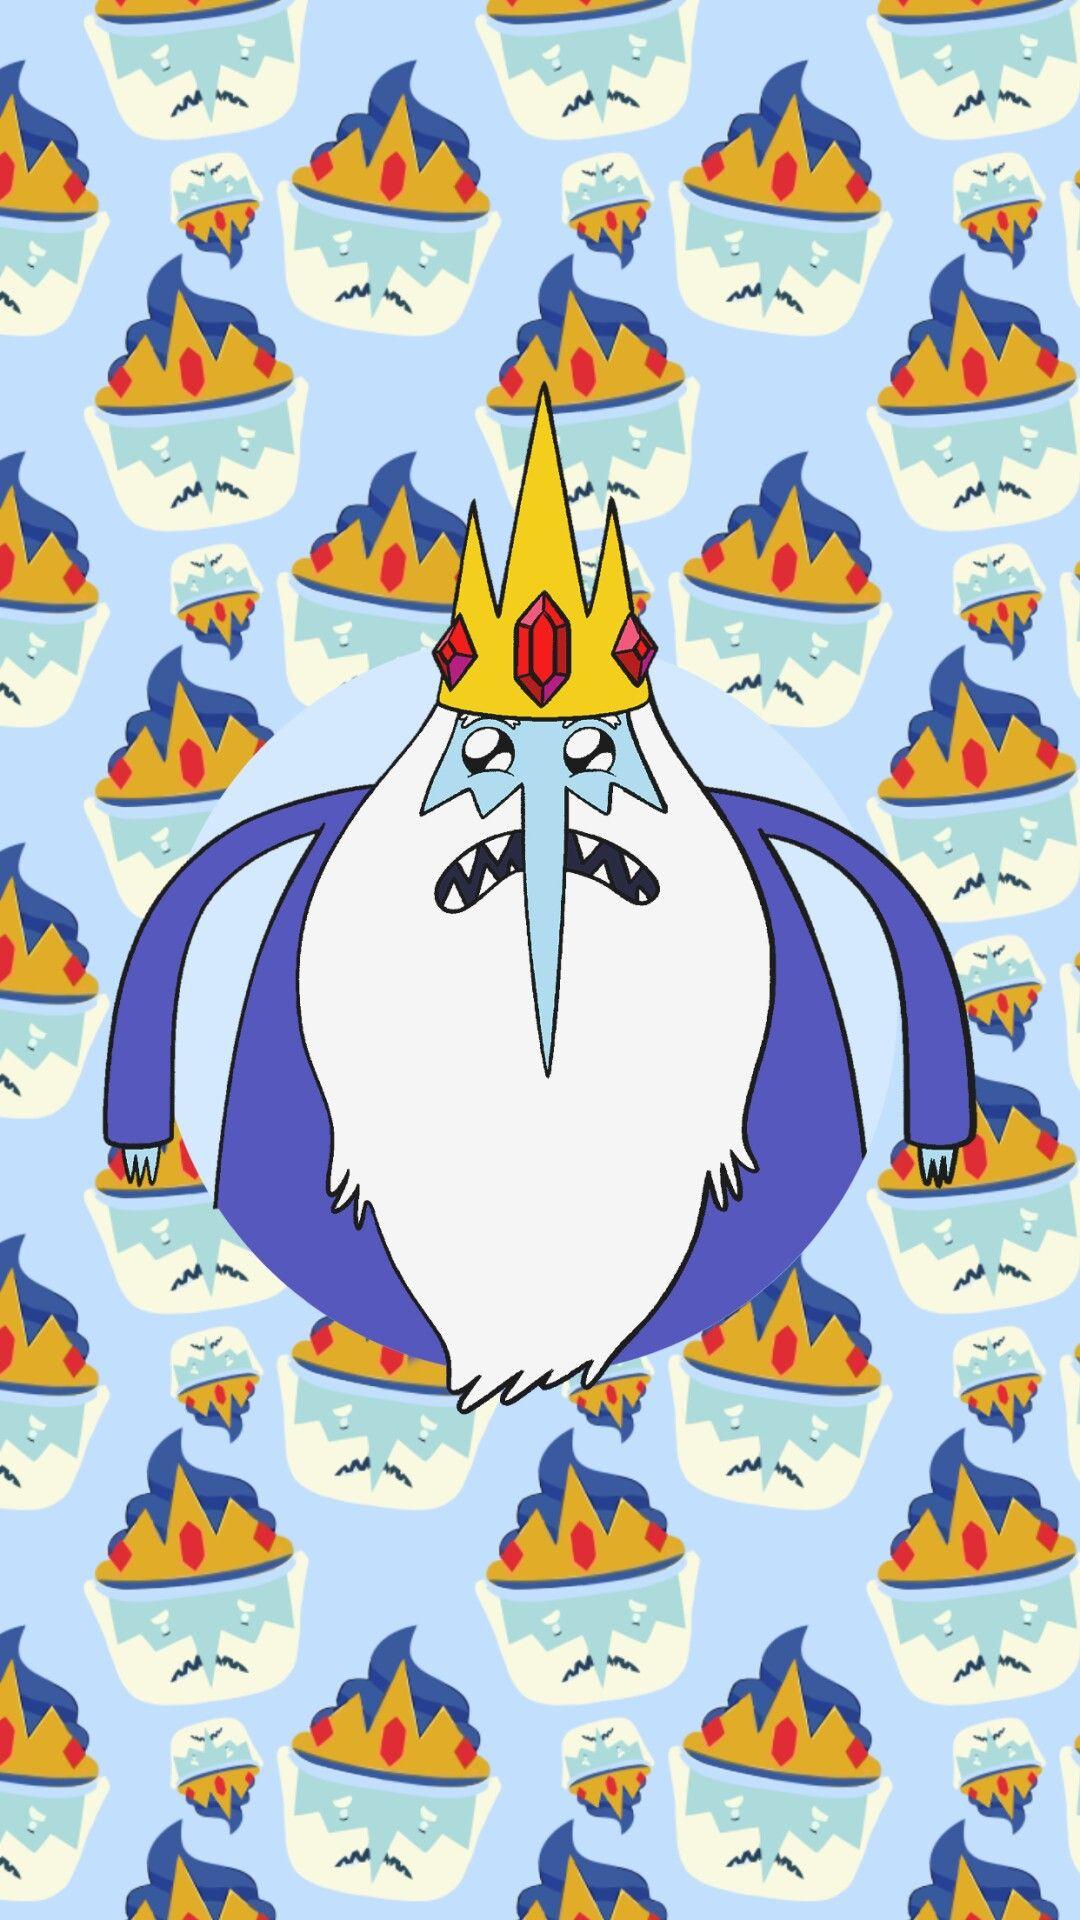 Ice King - Wallpaper - Sathitprasomsup - Com - Adventure Time Wallpaper Cupcake , HD Wallpaper & Backgrounds